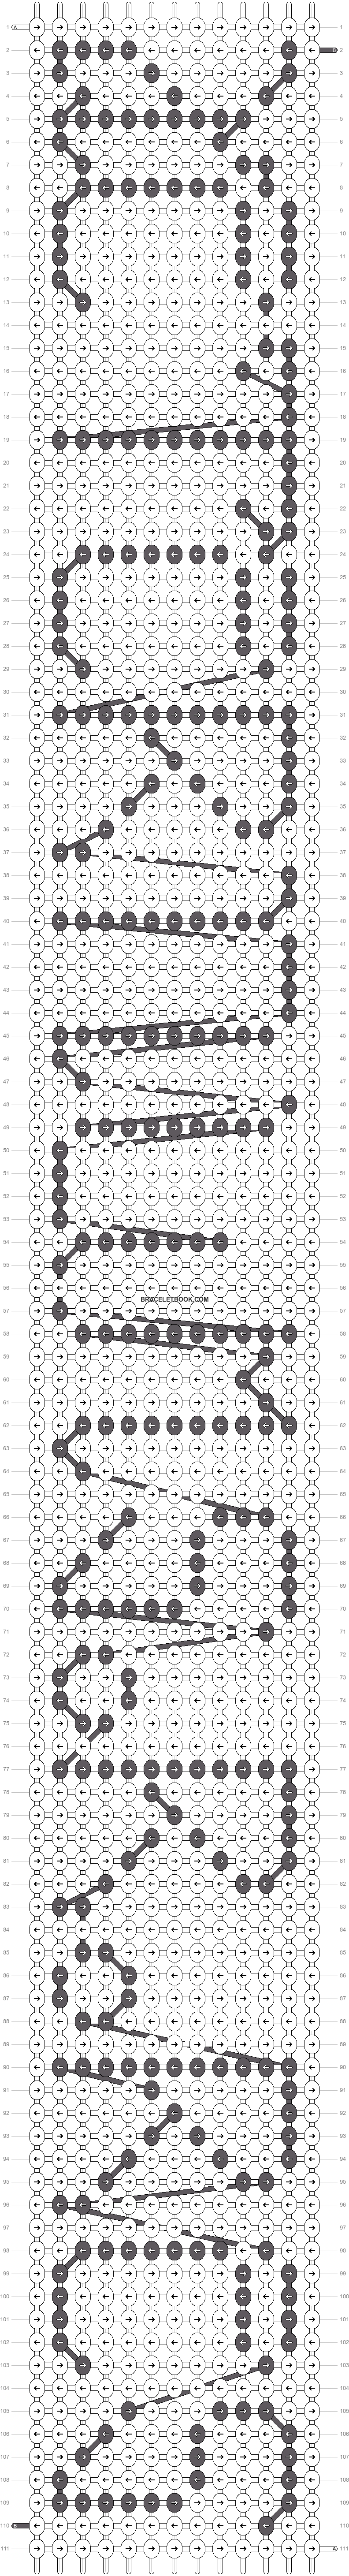 Alpha pattern #4352 pattern